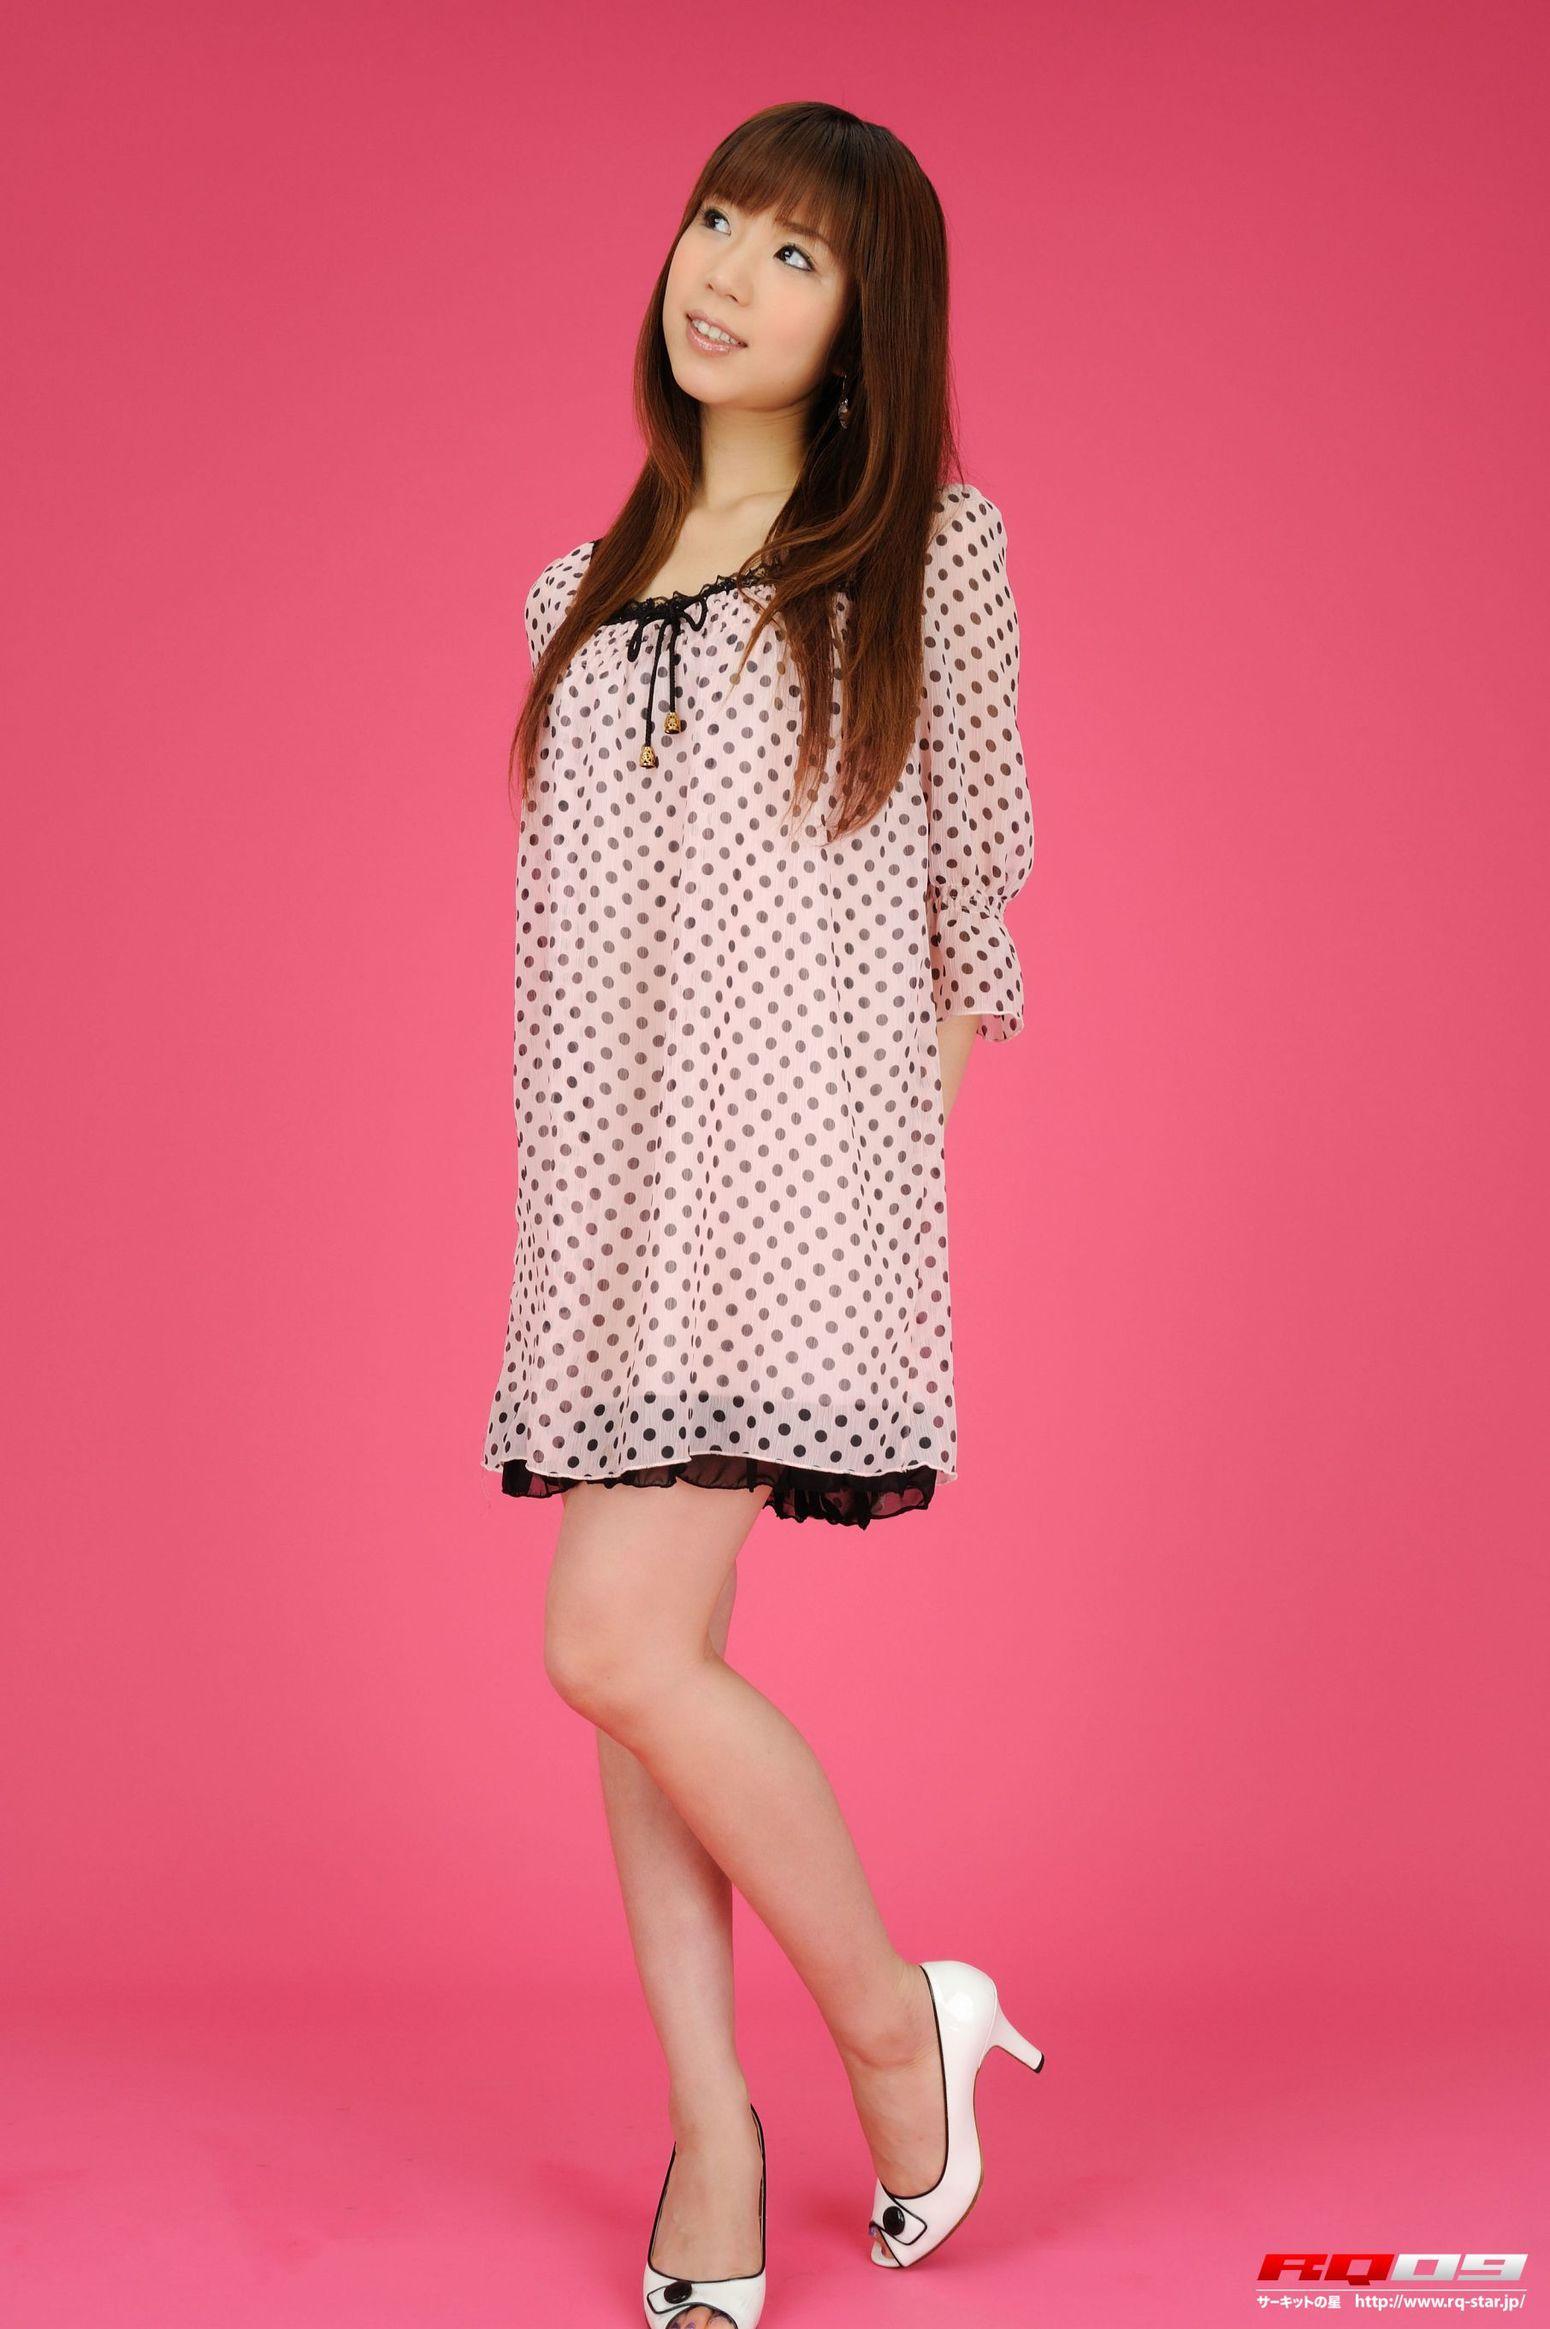 [RQ-STAR] NO.00159 Yuko Momokawa 桃川祐子 Private Dress 写真集 - Beautiful Leg